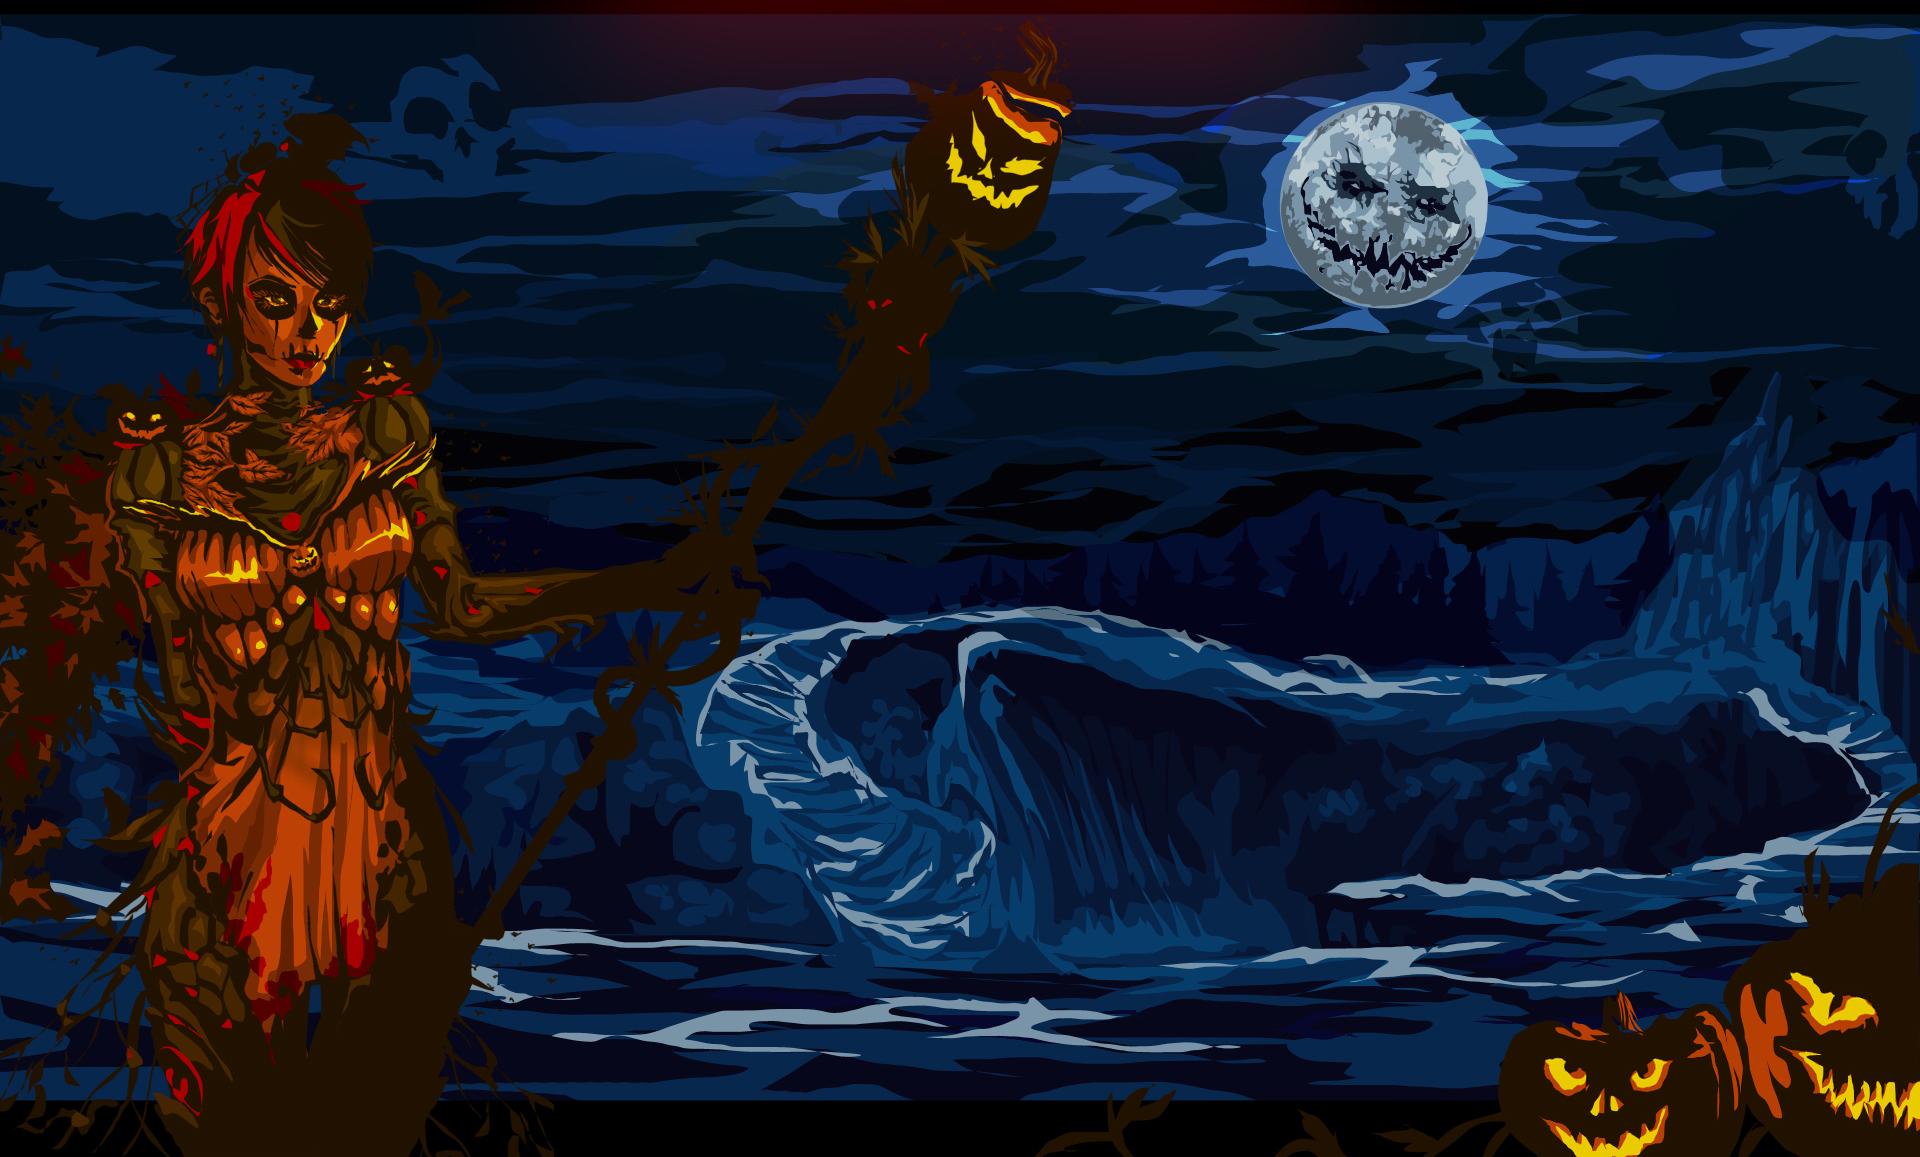 Fondos Para Fotos Hd: Halloween Wallpapers, Halloween Fondos Hd Gratis